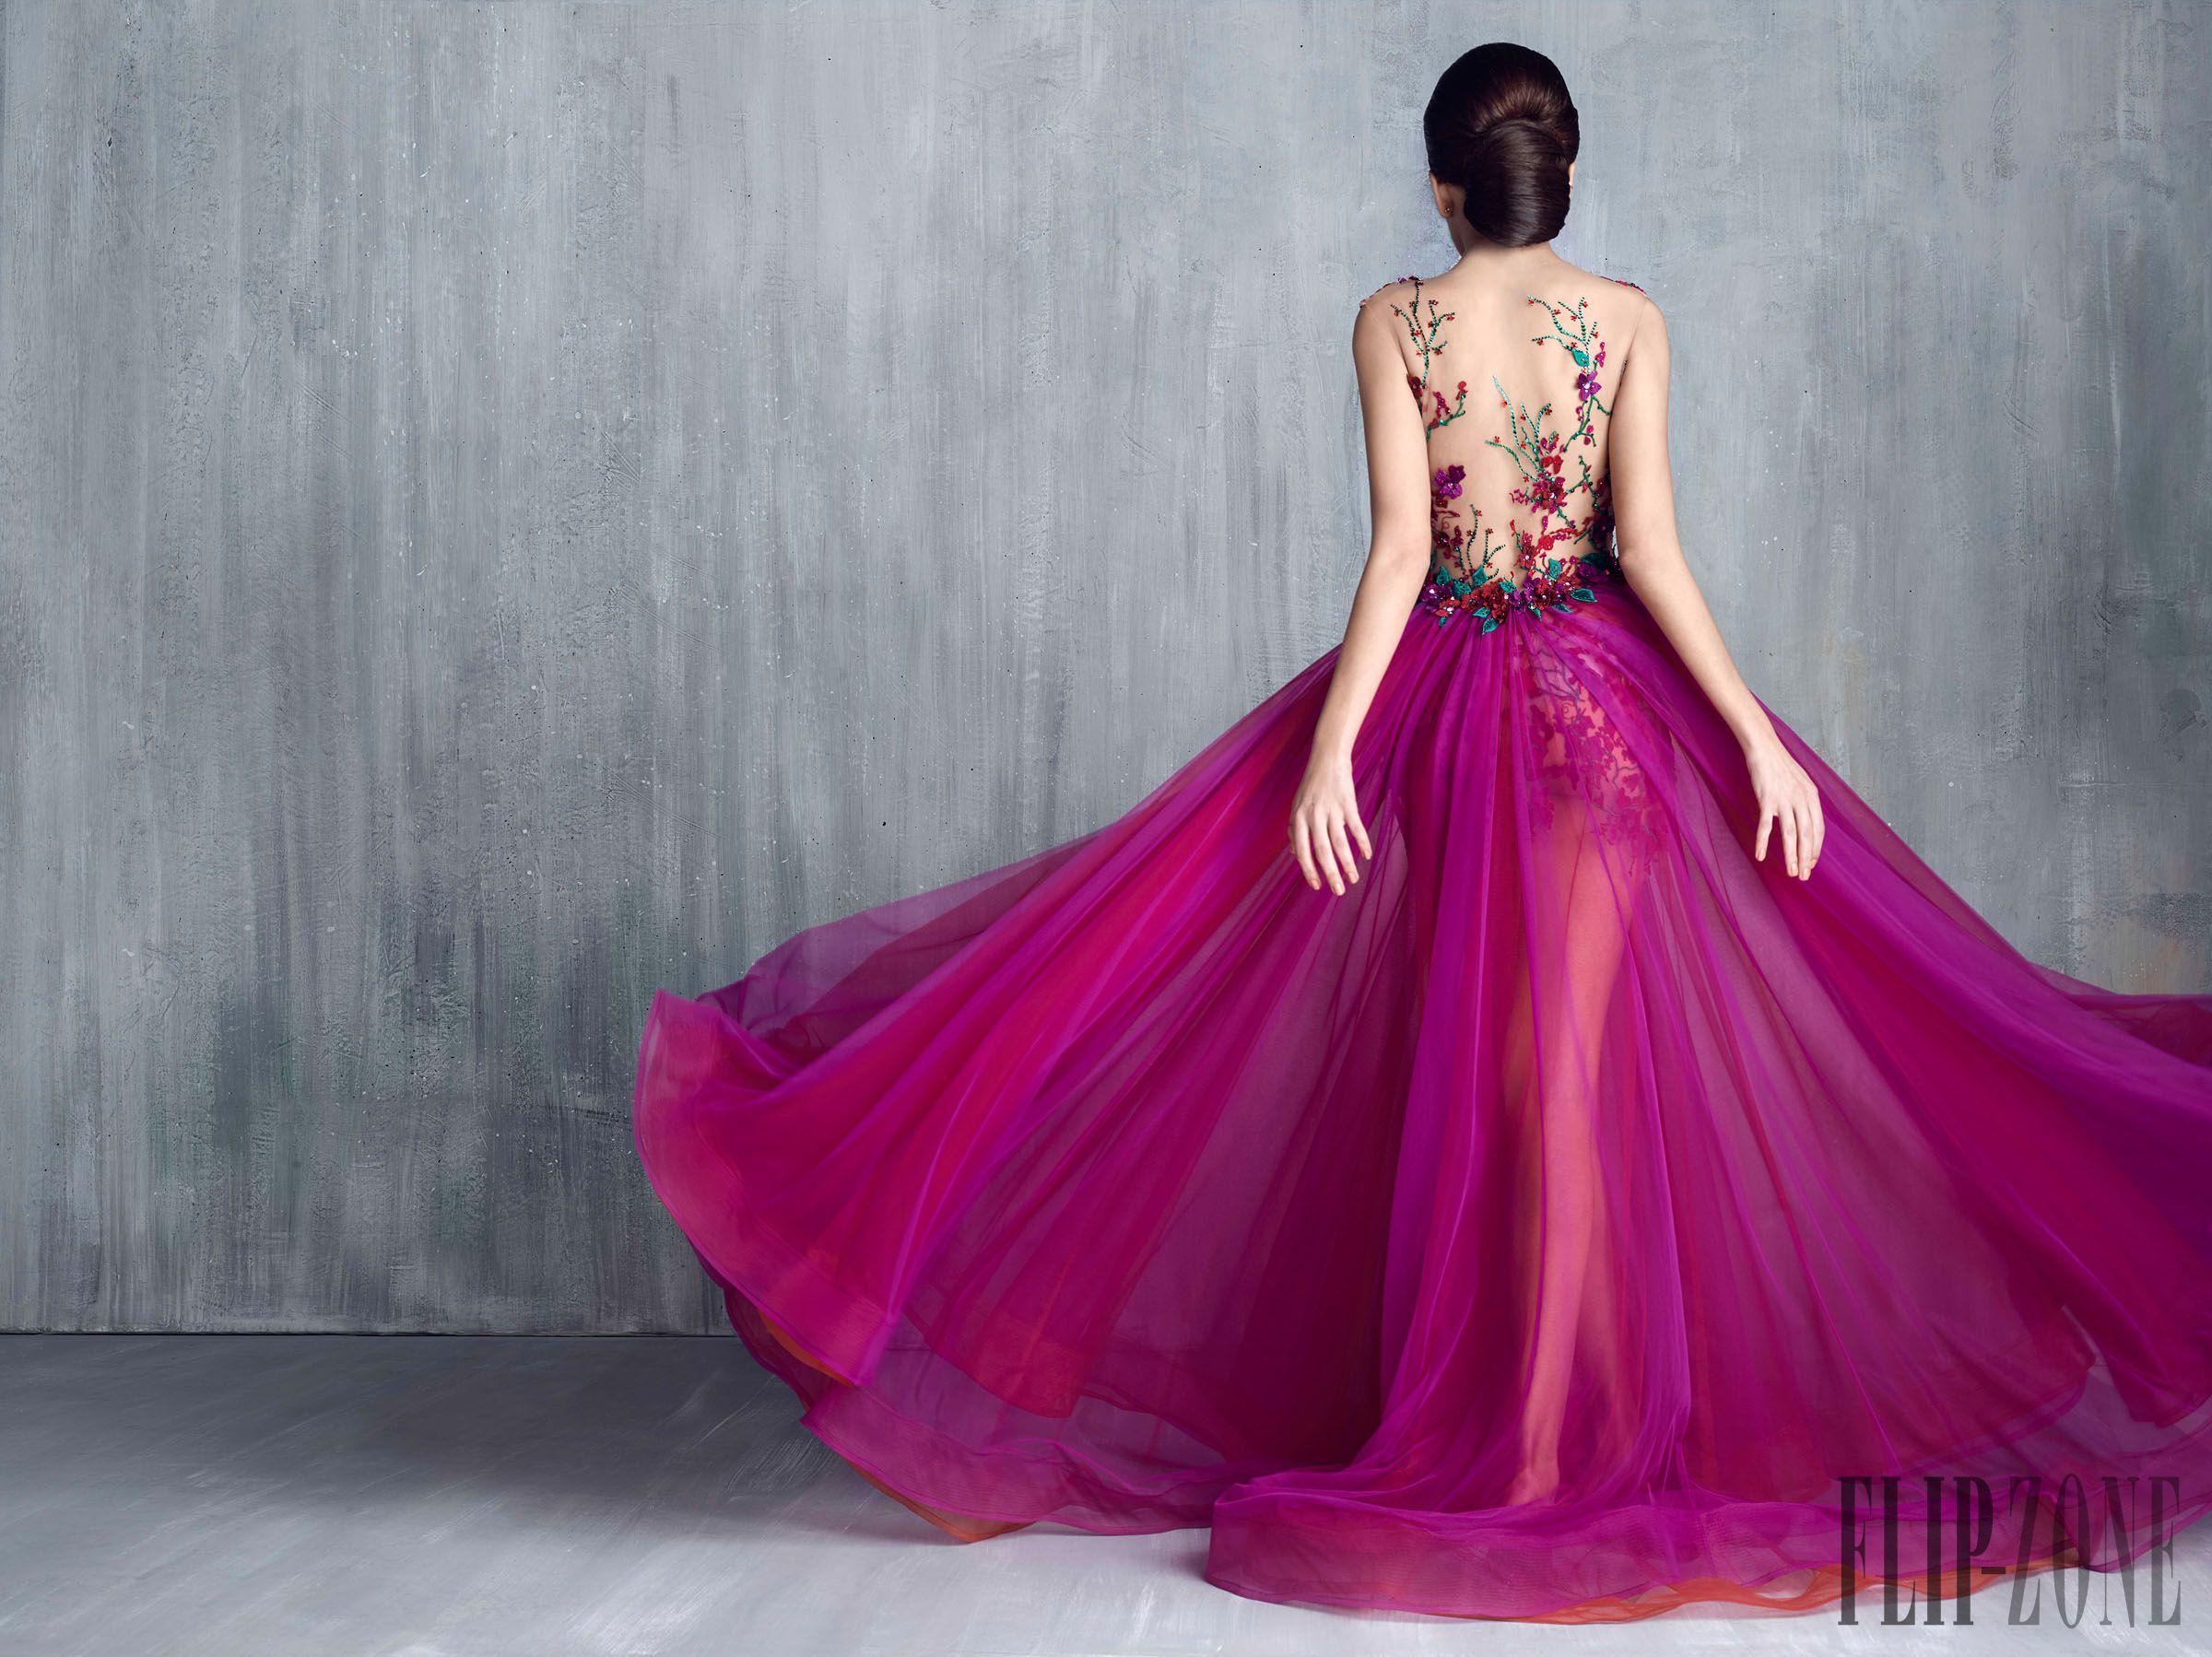 Pin de Zaira Mendoza en Clothing | Pinterest | Vestiditos, Vestidos ...